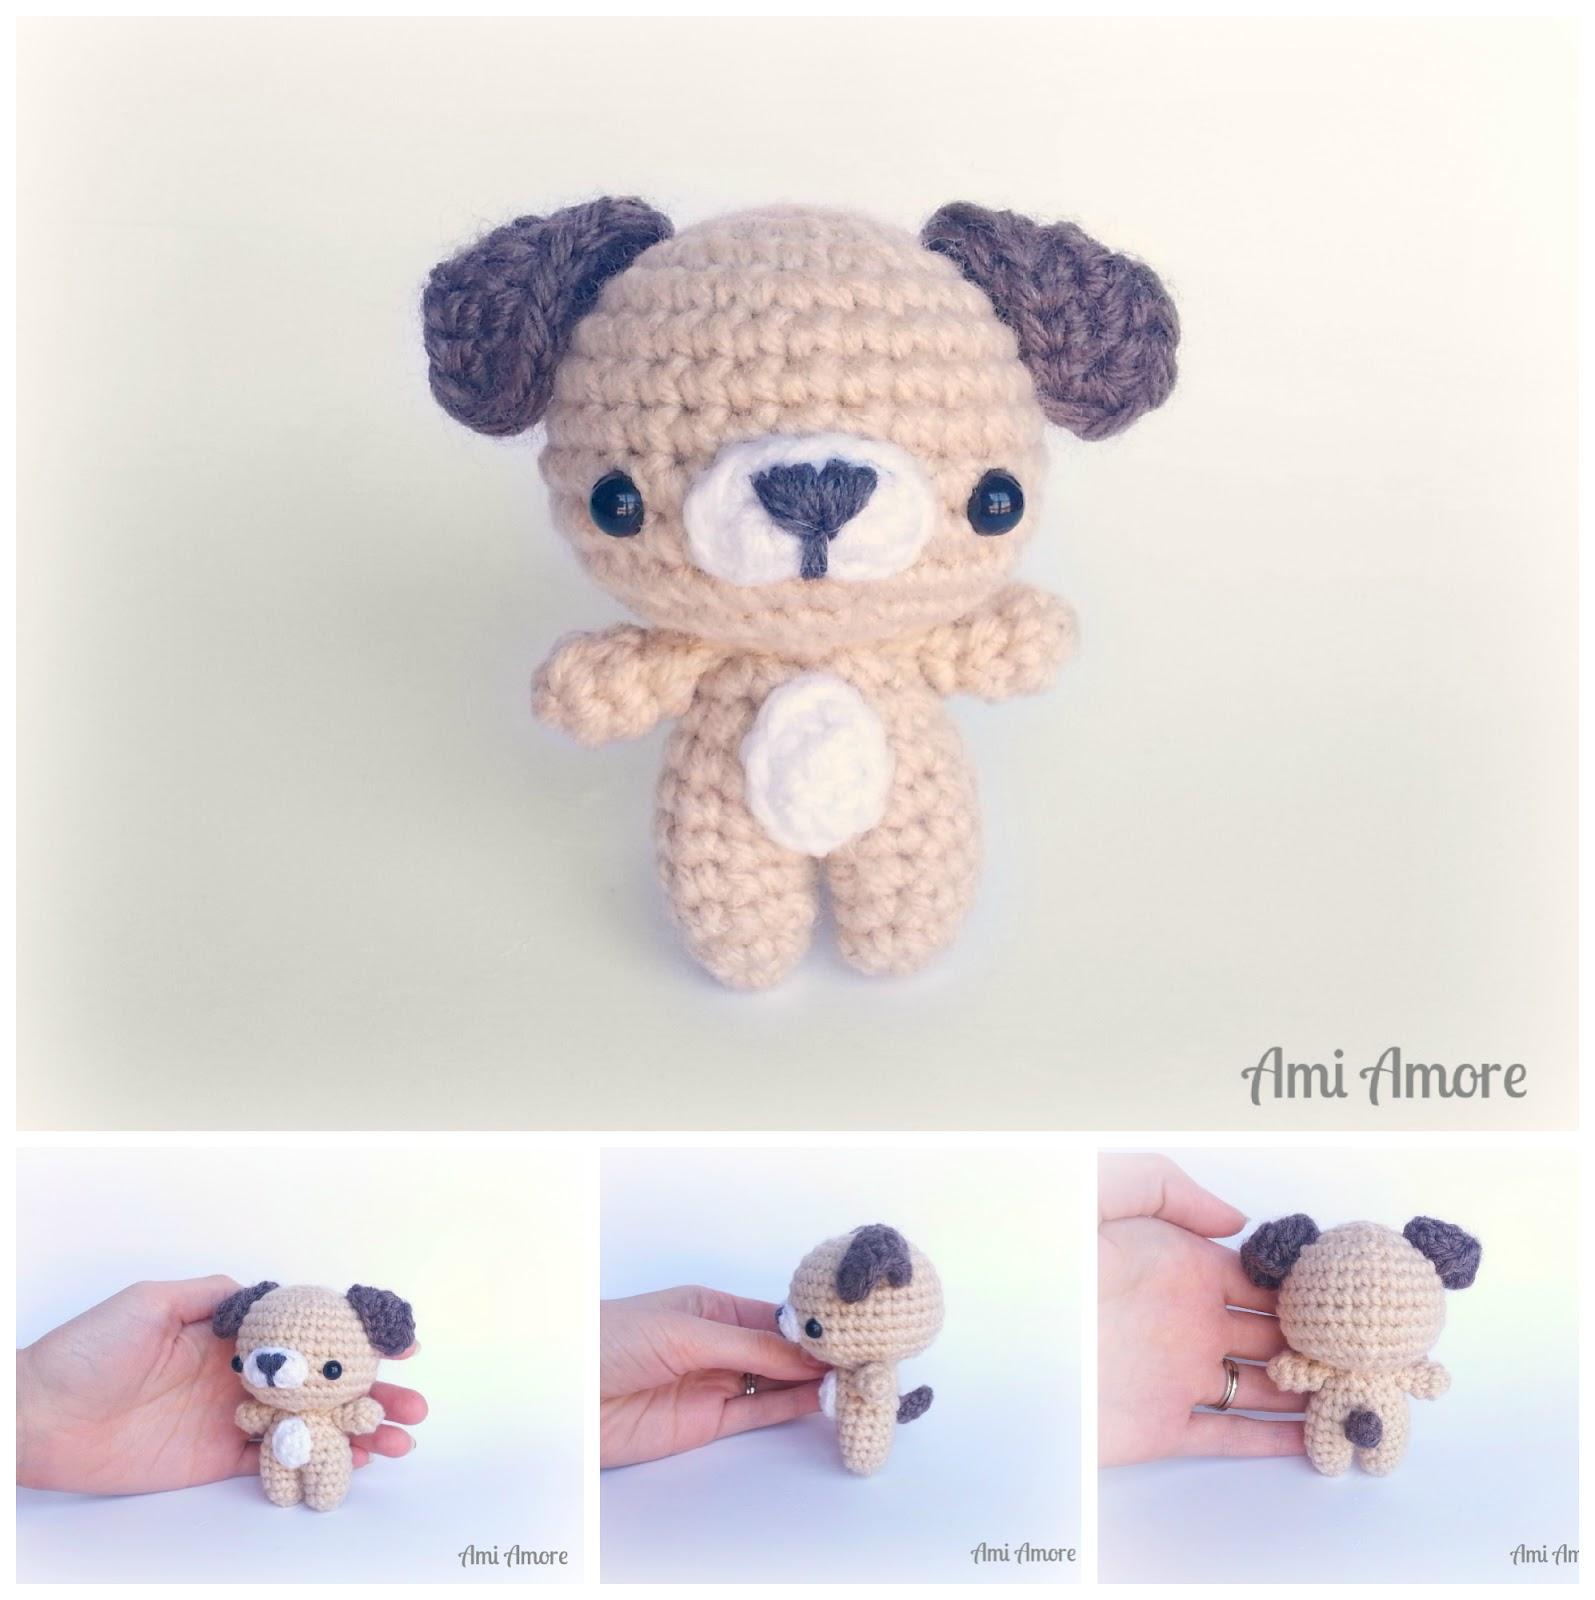 Ami Amore: Cutie Pup & Hello Kitty!